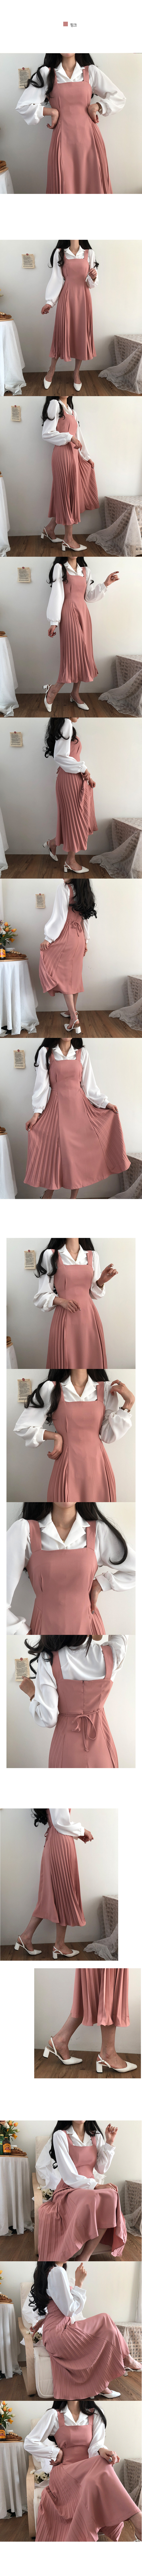 Lindy Pleated Bustier Long Dress